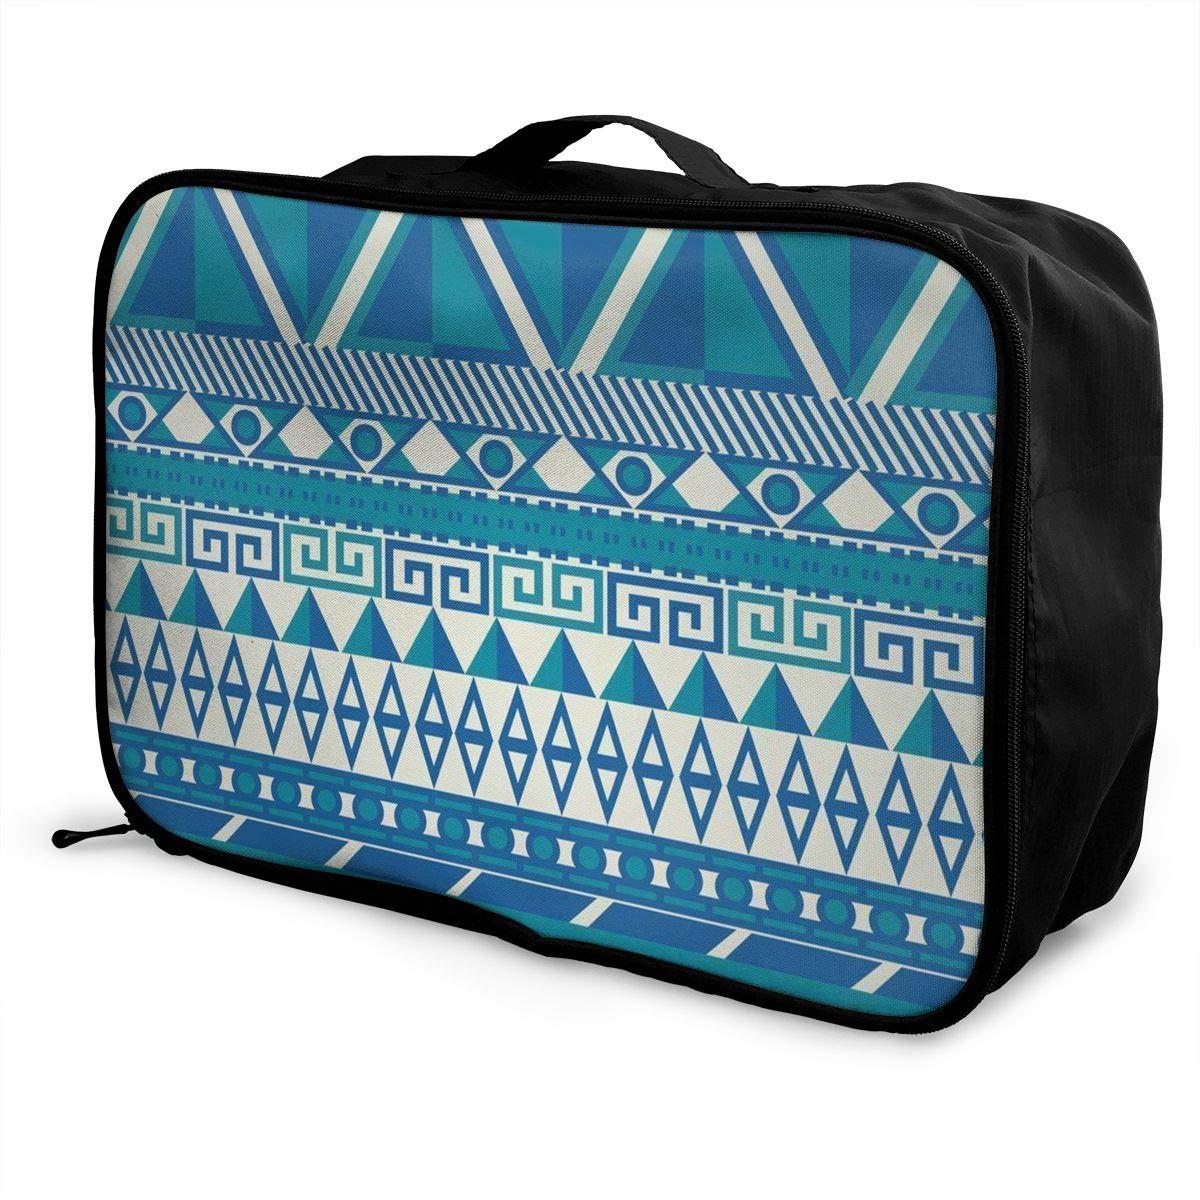 ADGAI Blue Geometric Pattern of Graphics Canvas Travel Weekender Bag,Fashion Custom Lightweight Large Capacity Portable Luggage Bag,Suitcase Trolley Bag